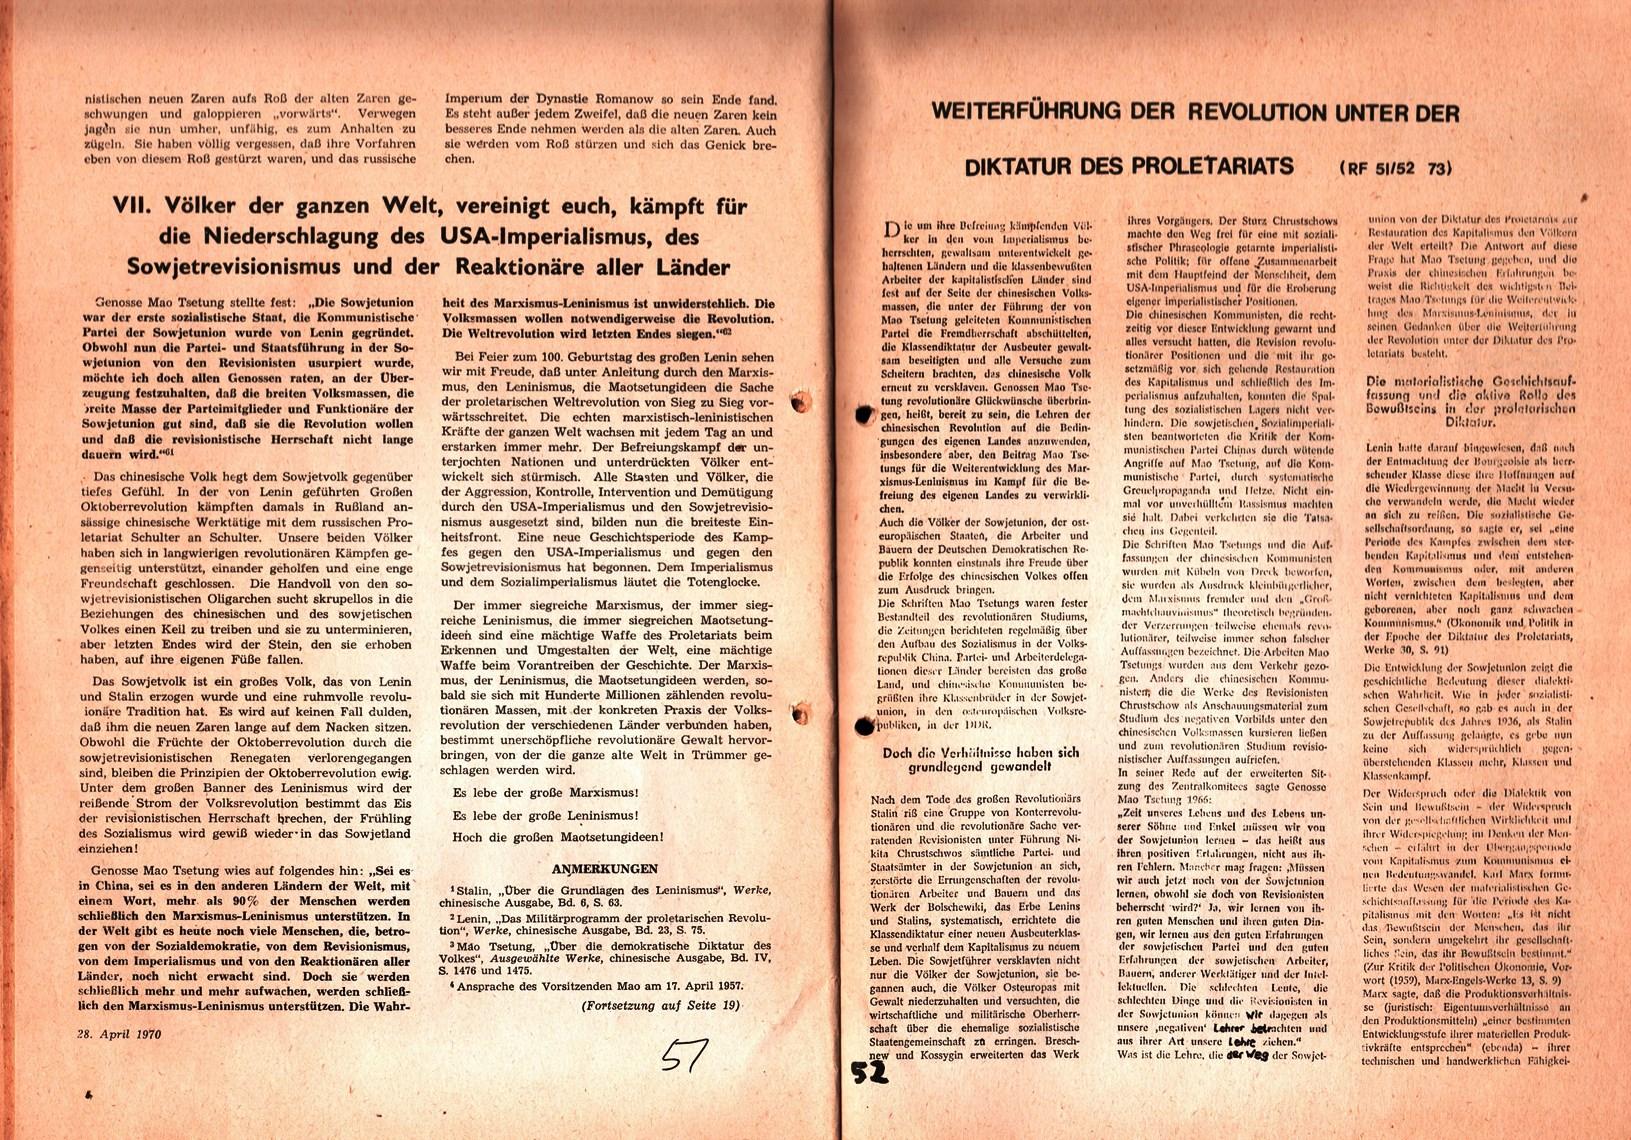 KSV_1974_Materialien_zur_Programmdiskussion_01_027